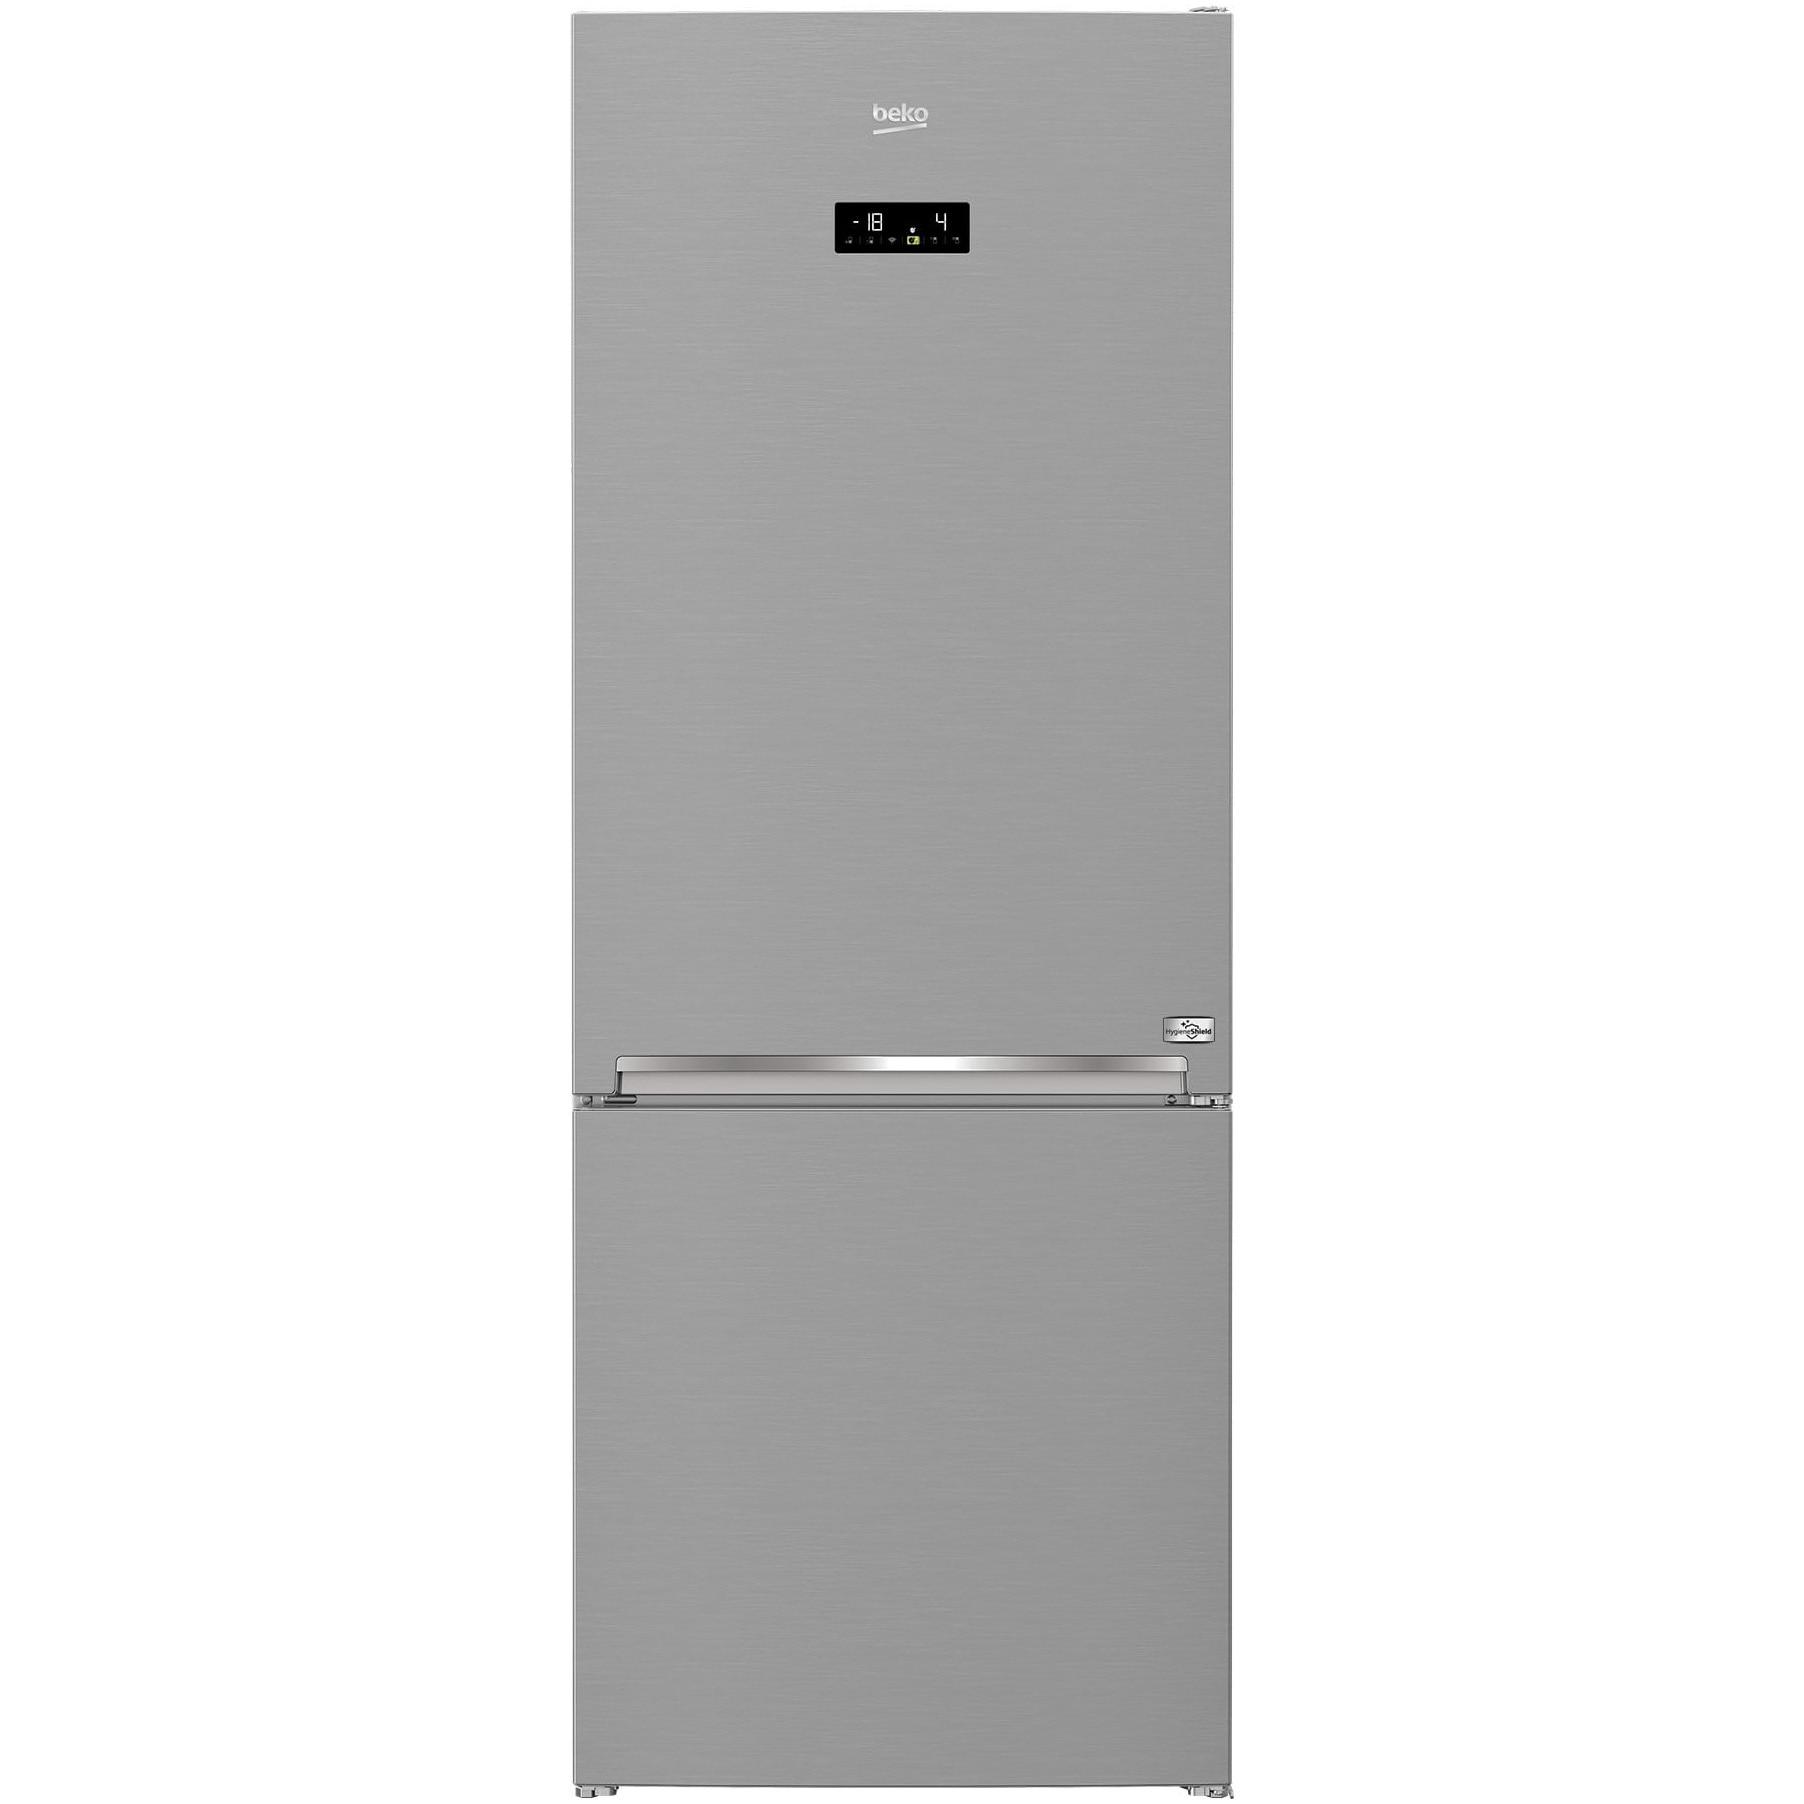 Fotografie Combina frigorifica Beko RCNE560E40ZLXPHUN, 495 l, Clasa E, Hygiene Shield, NeoFrost Dual Cooling, HarvestFresh, Wi-Fi, H 192 cm, Argintiu